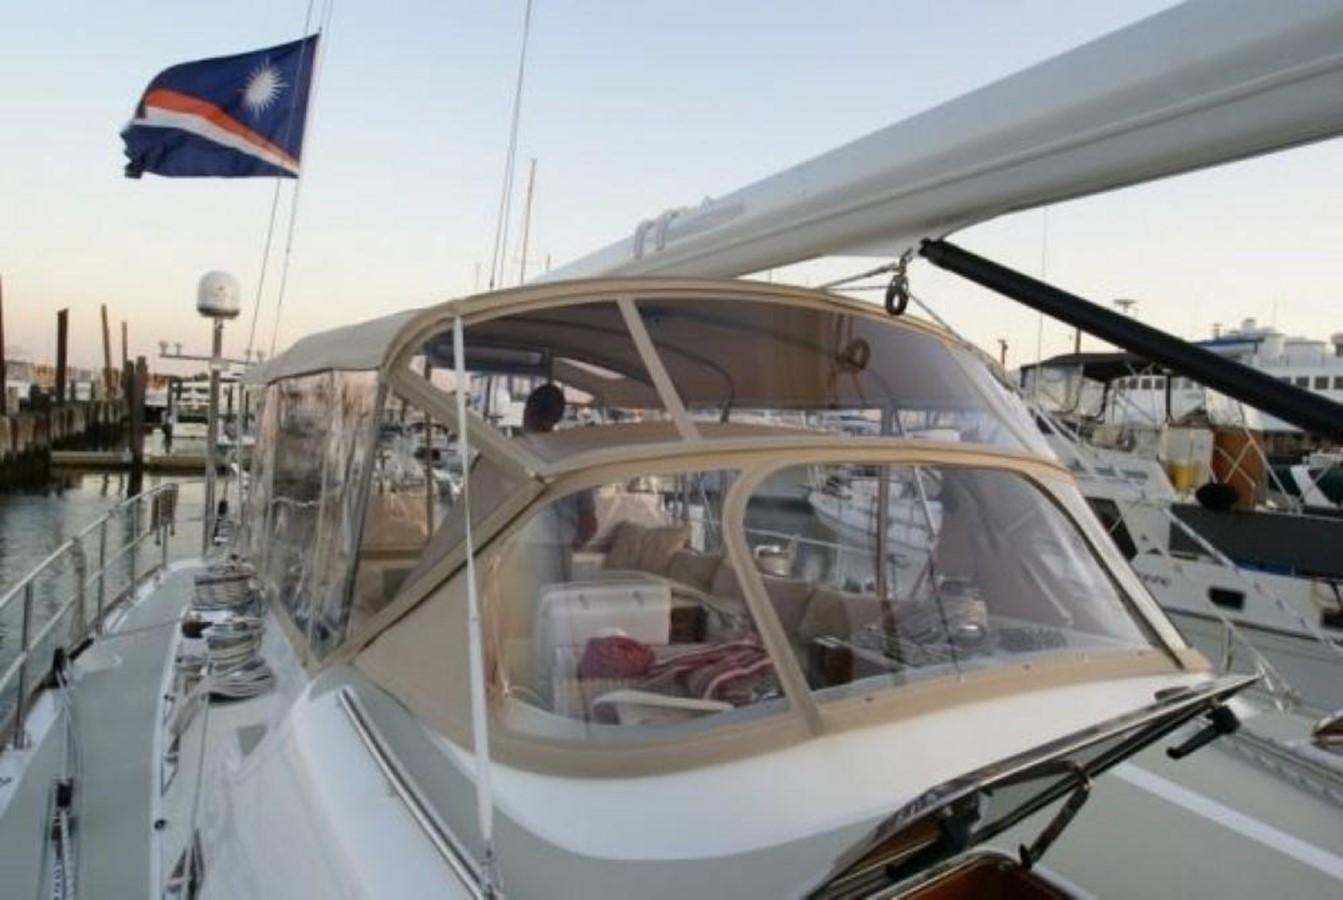 2007 HYLAS Hylas 70 centreboard cruiser Sloop 2274433